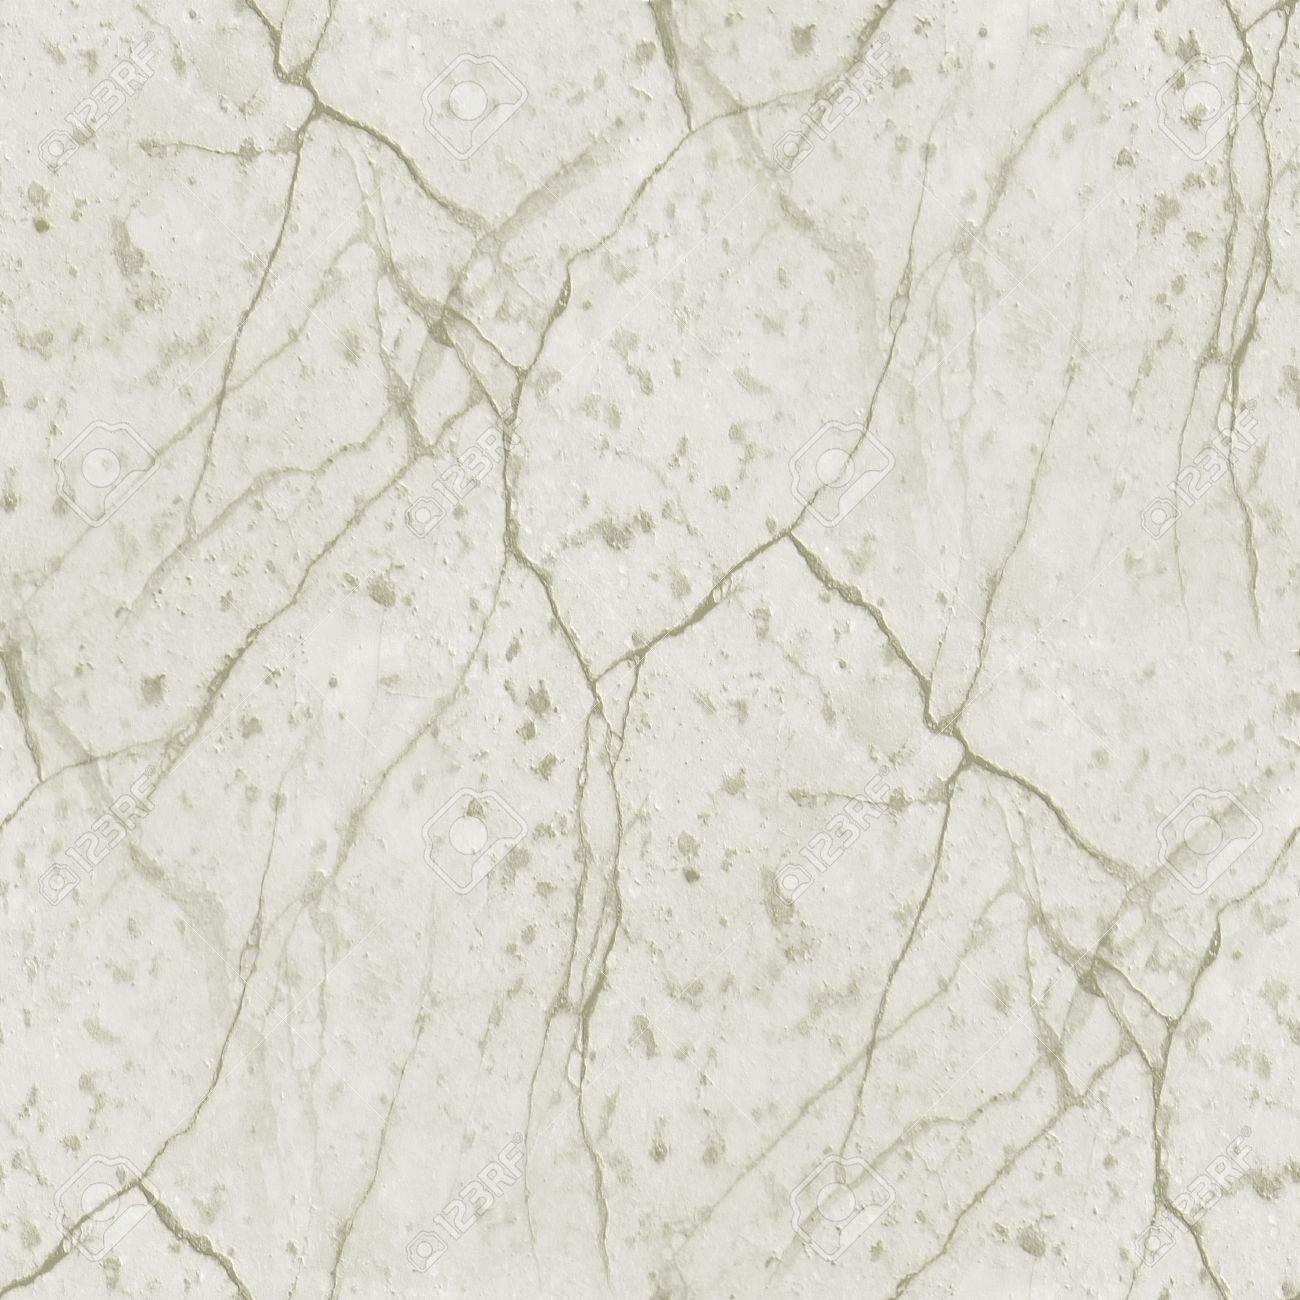 white marble texture seamless. abstract white marble texture  seamless tile Stock Photo 80543627 Abstract White Marble Texture Seamless Tile Picture